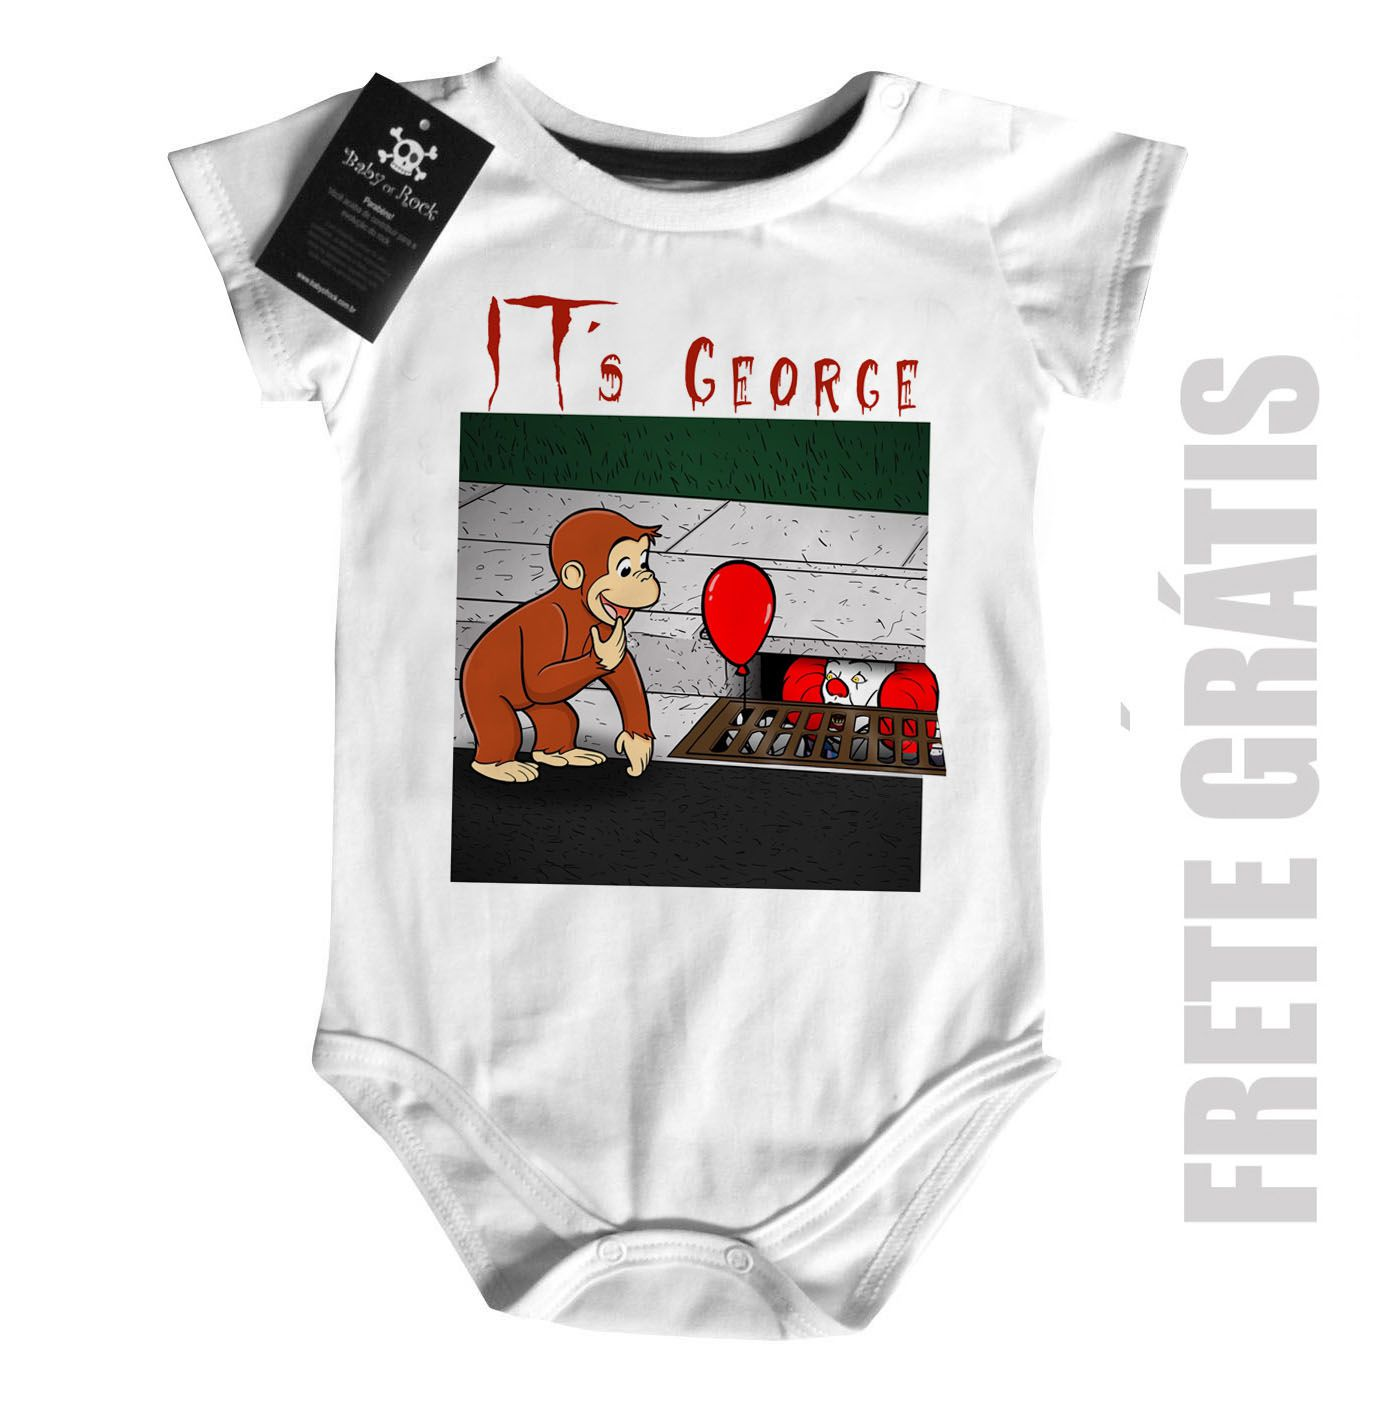 Body Bebê It a Coisa e o George Curioso - White  - Baby Monster S/A